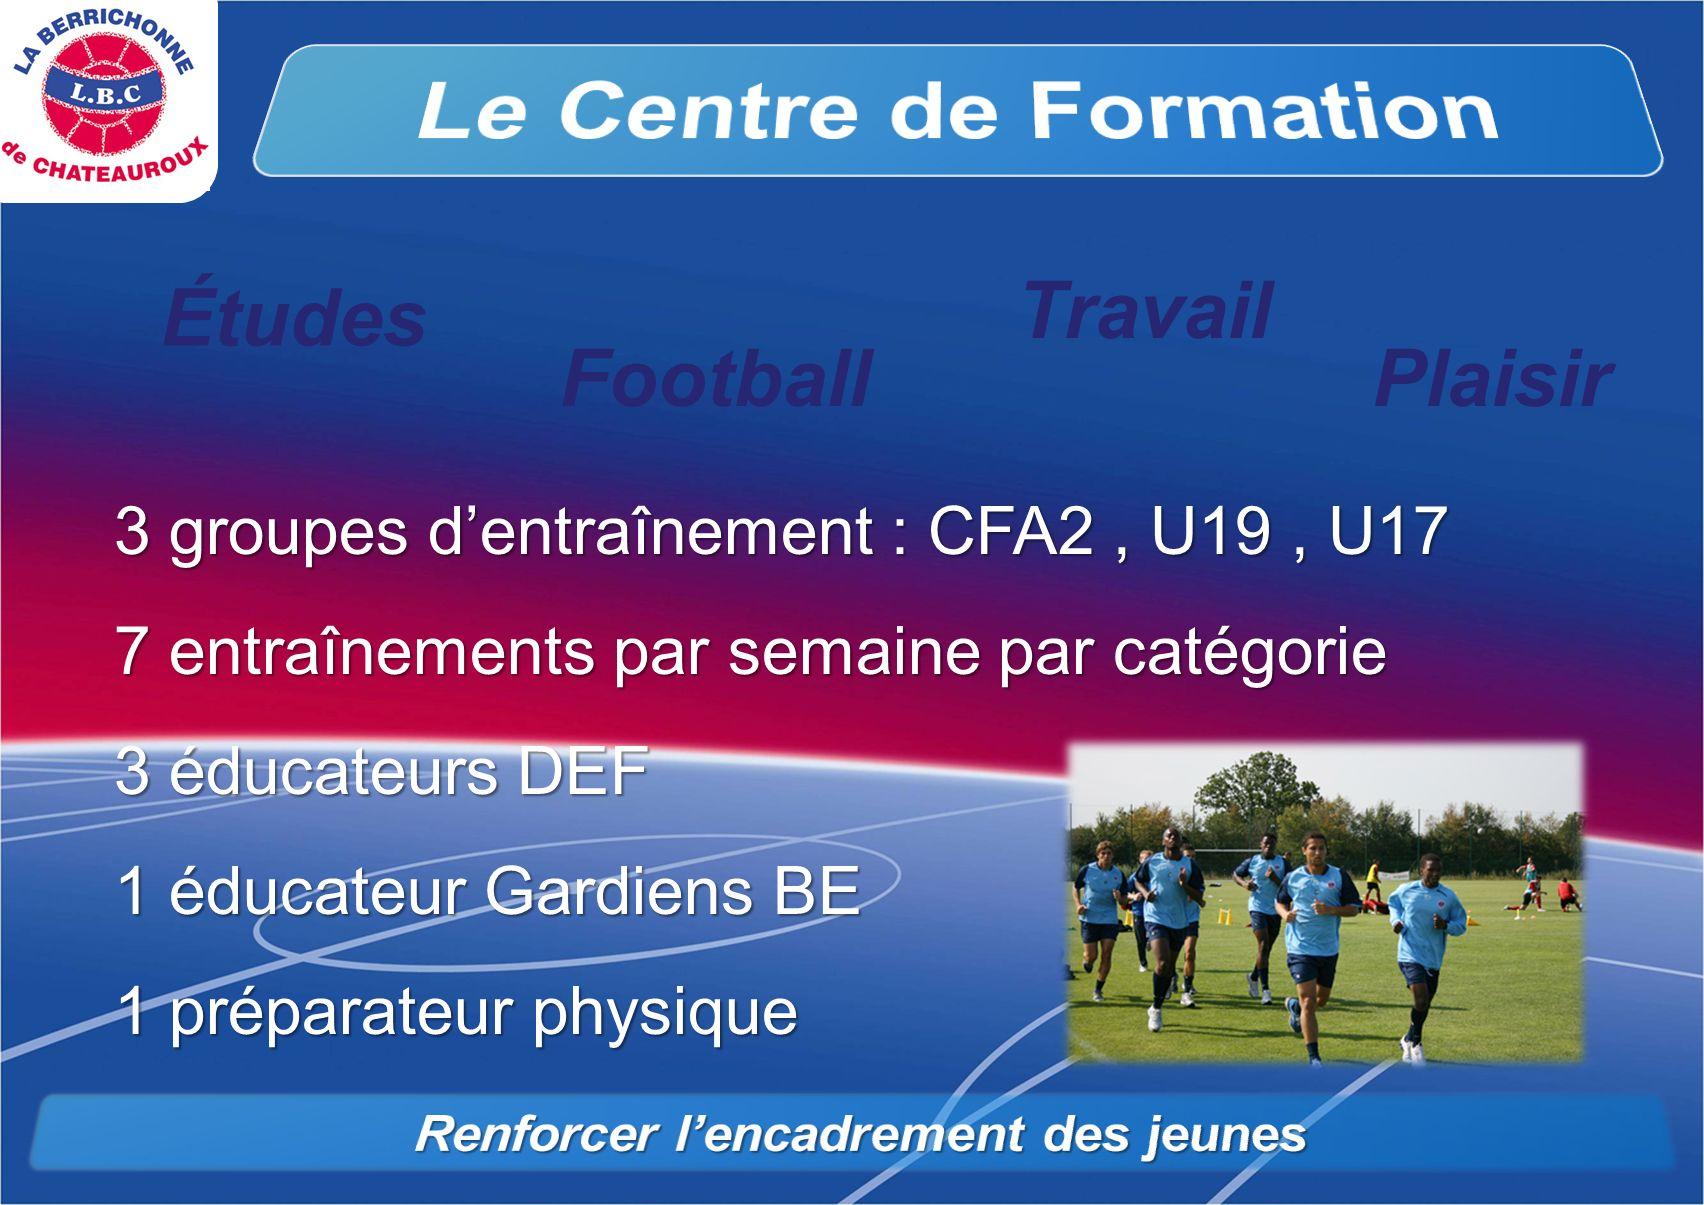 U 17 national U 19 national CFA 2